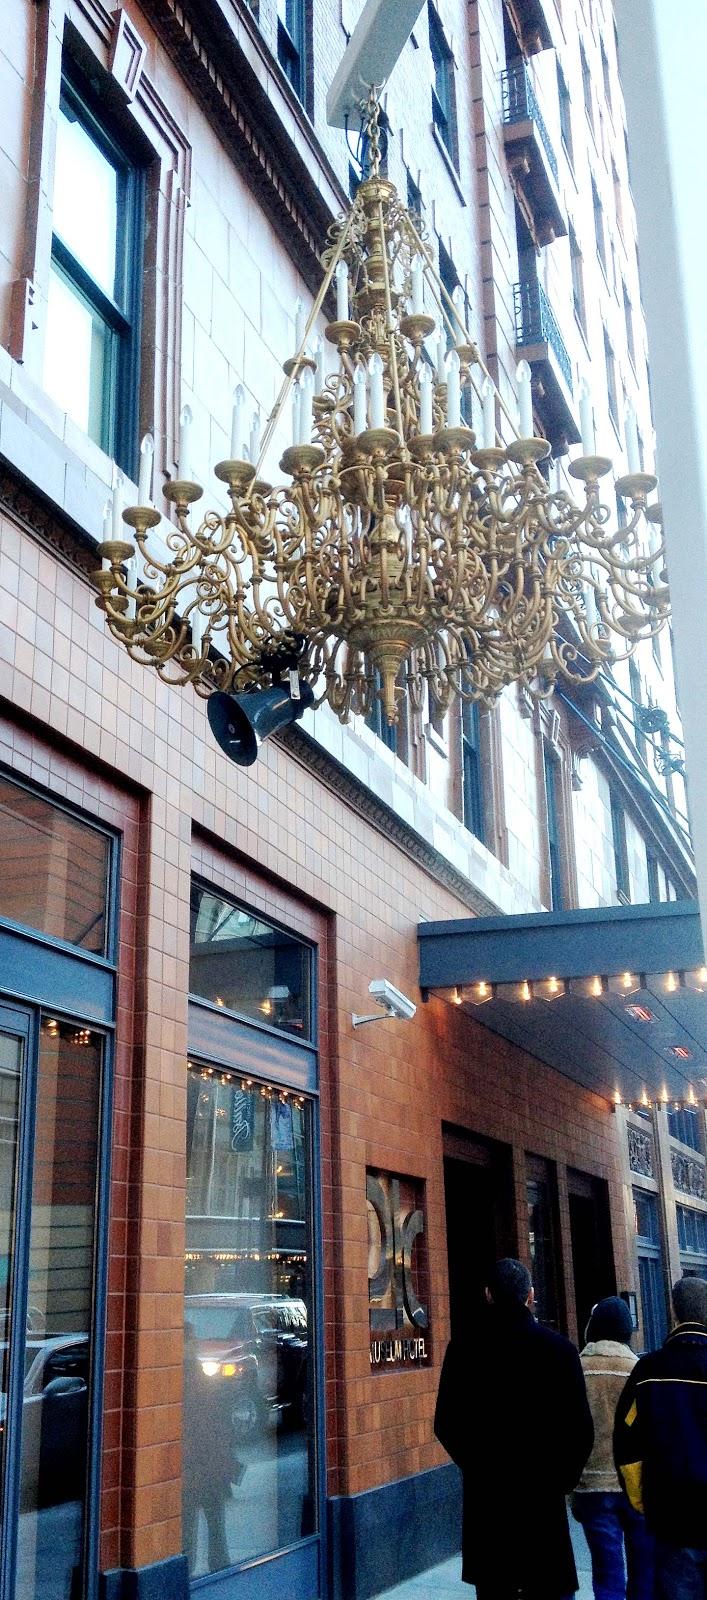 Entertaining Views From Cincinnati: 21c Museum Hotel